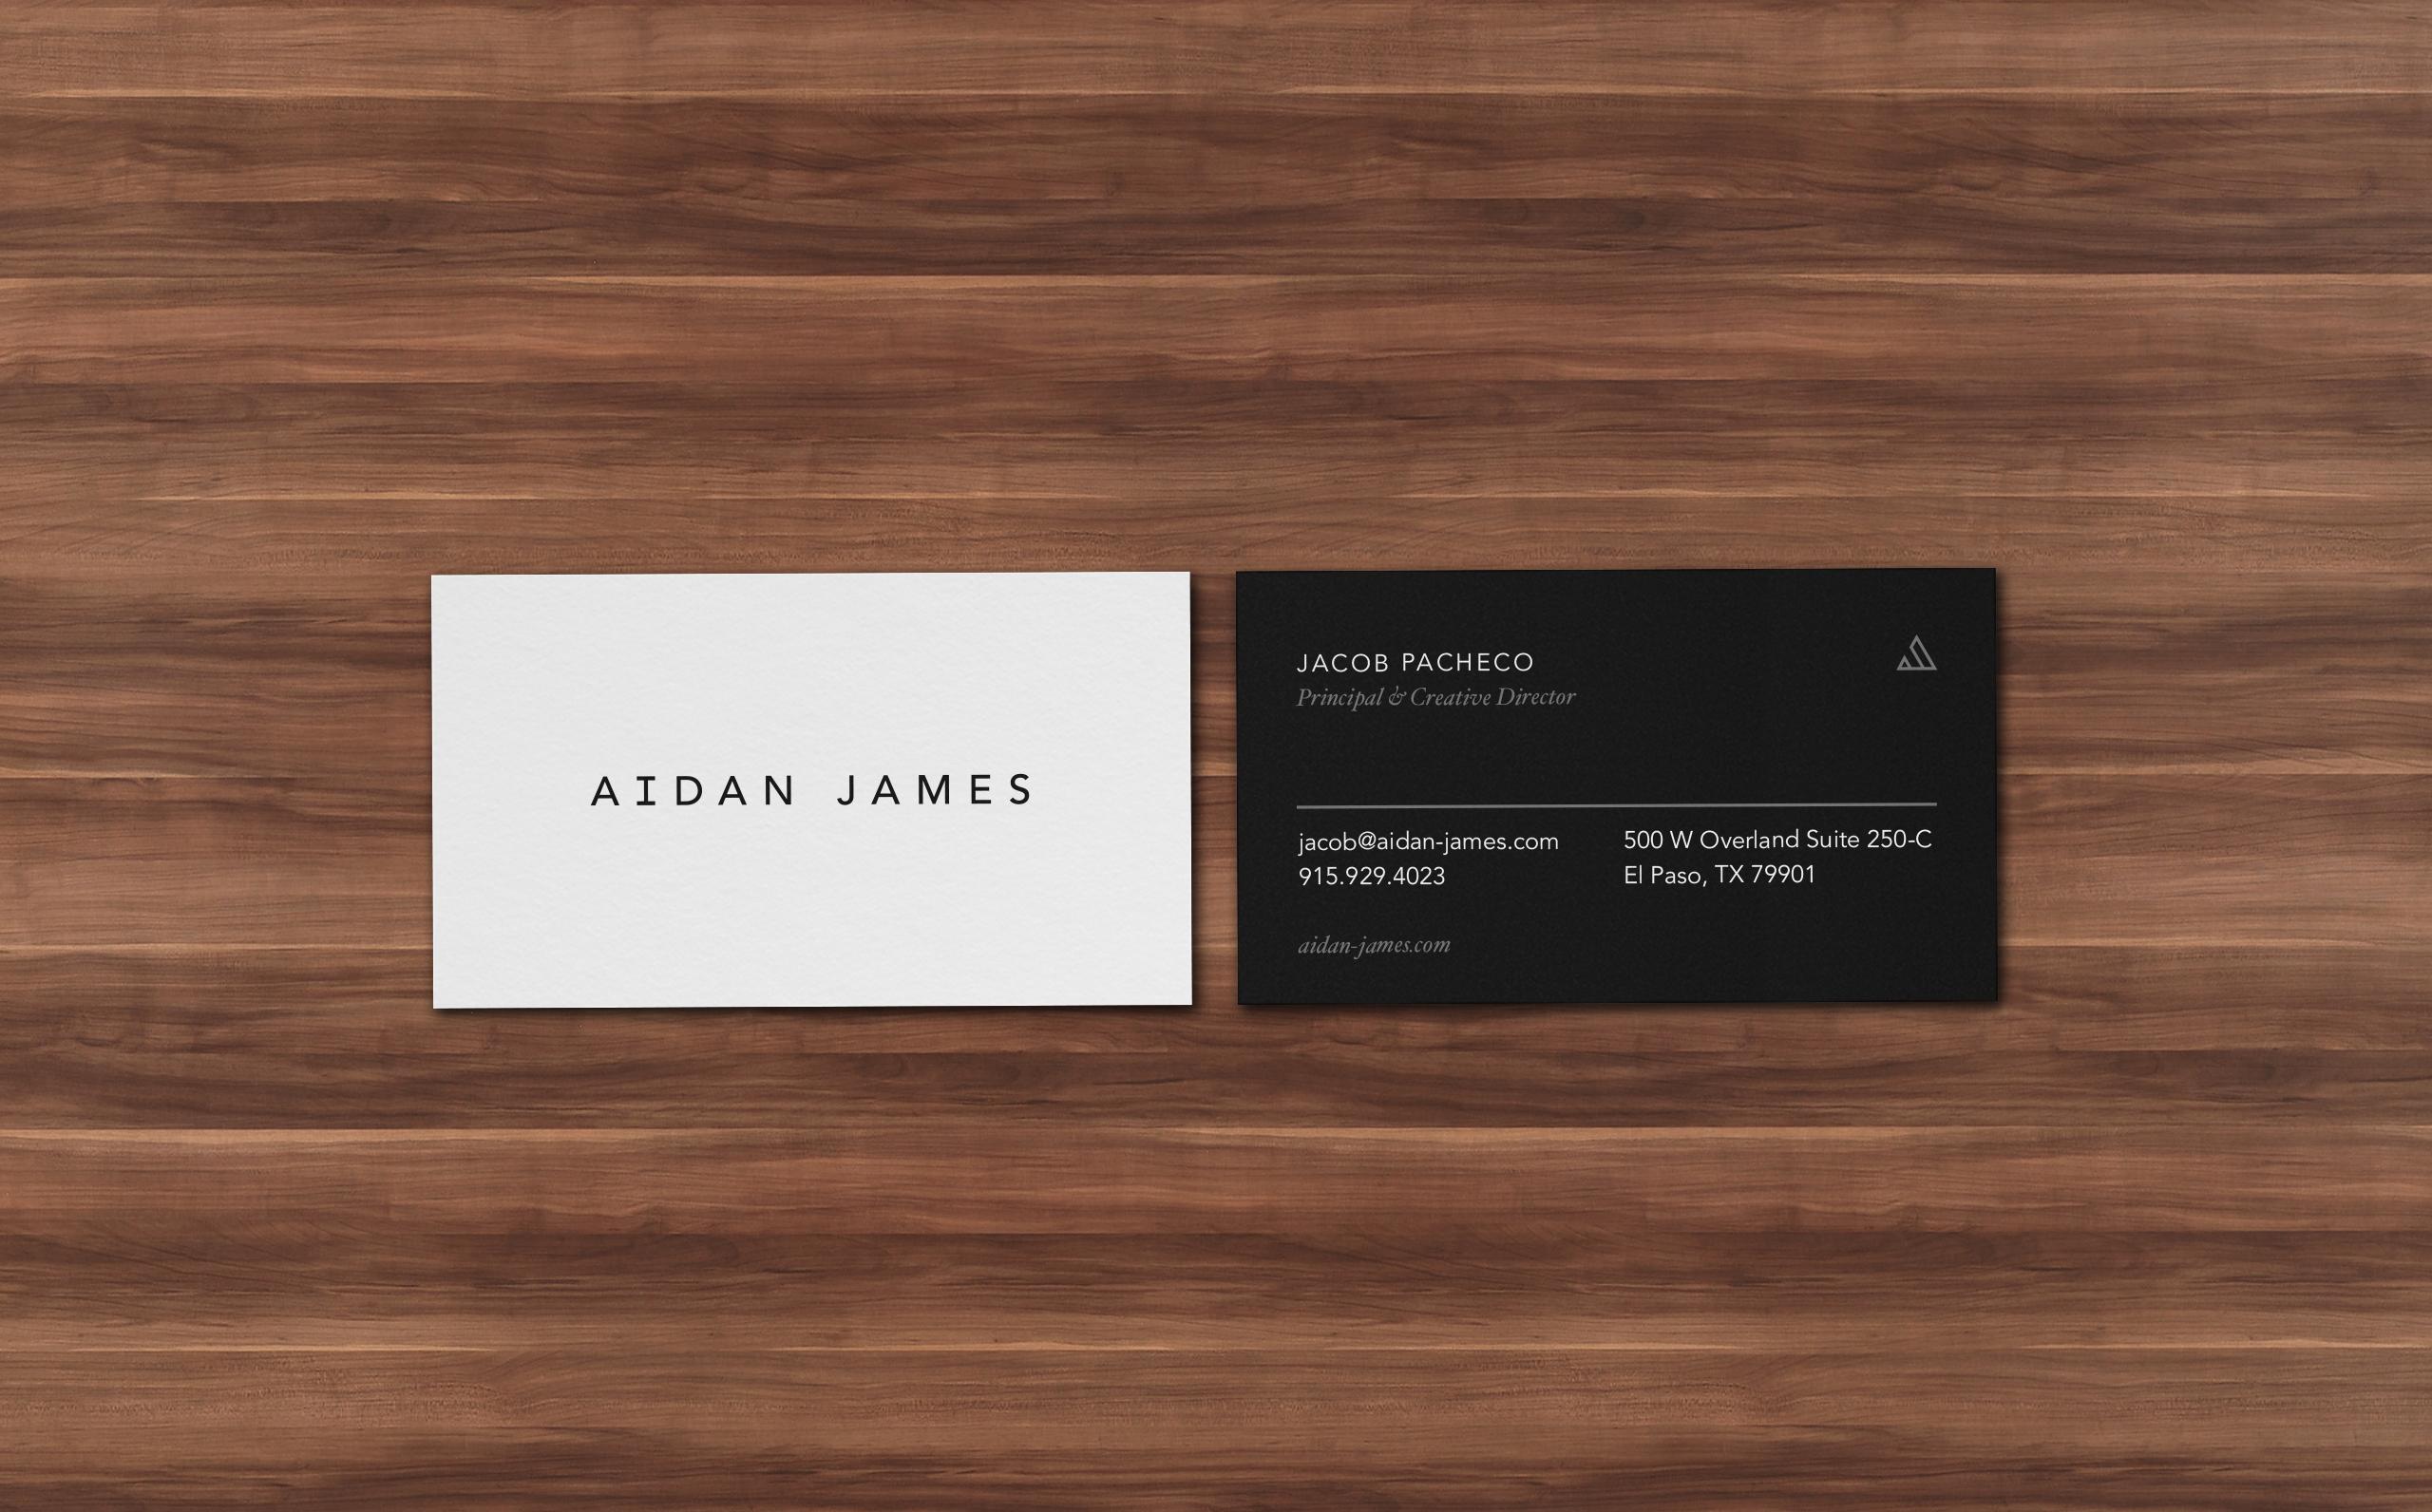 Aidan_James_07